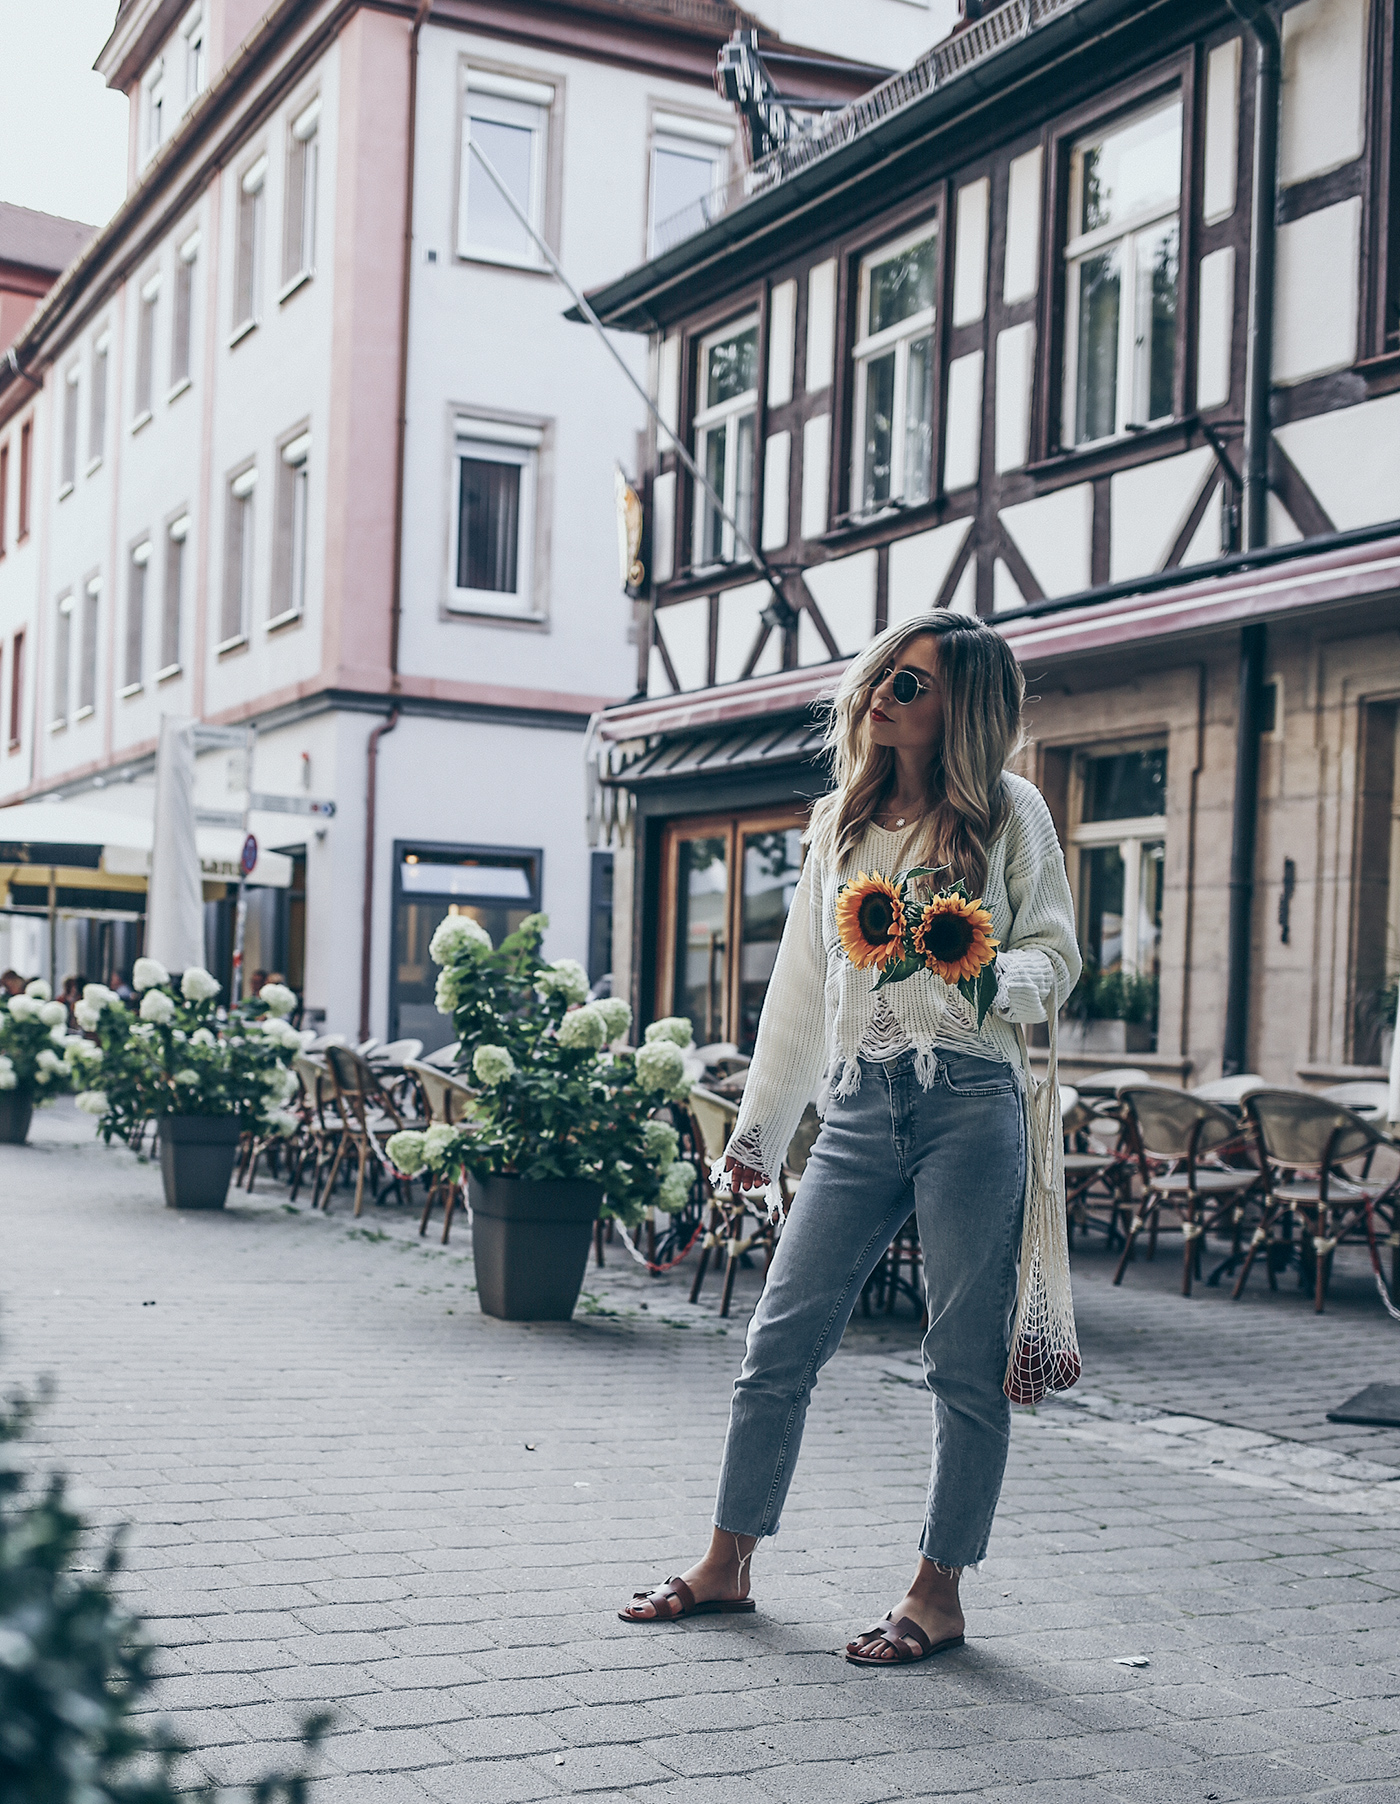 Hermes-Oran-Sandals-Outfit-Net-Bag-Summer-Trend-2017-Street